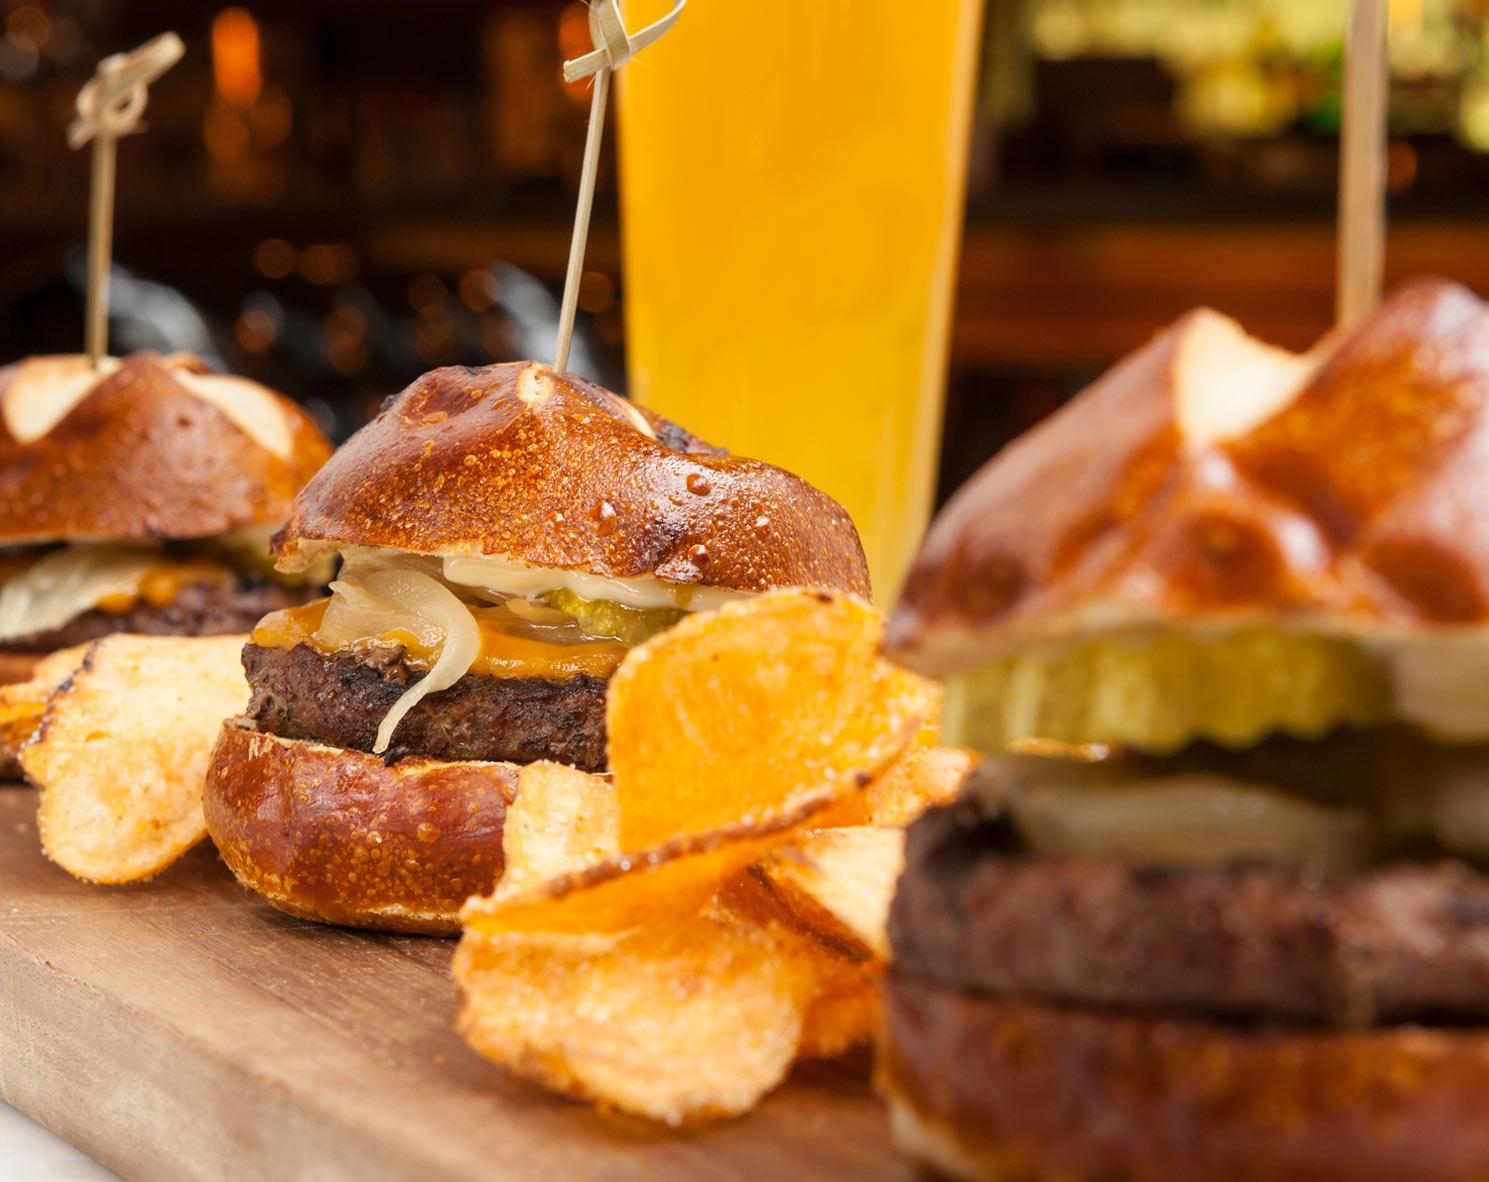 Food_photography_sacramento_best_happy_hour_sliders_burger_beer_specials_patio.jpg